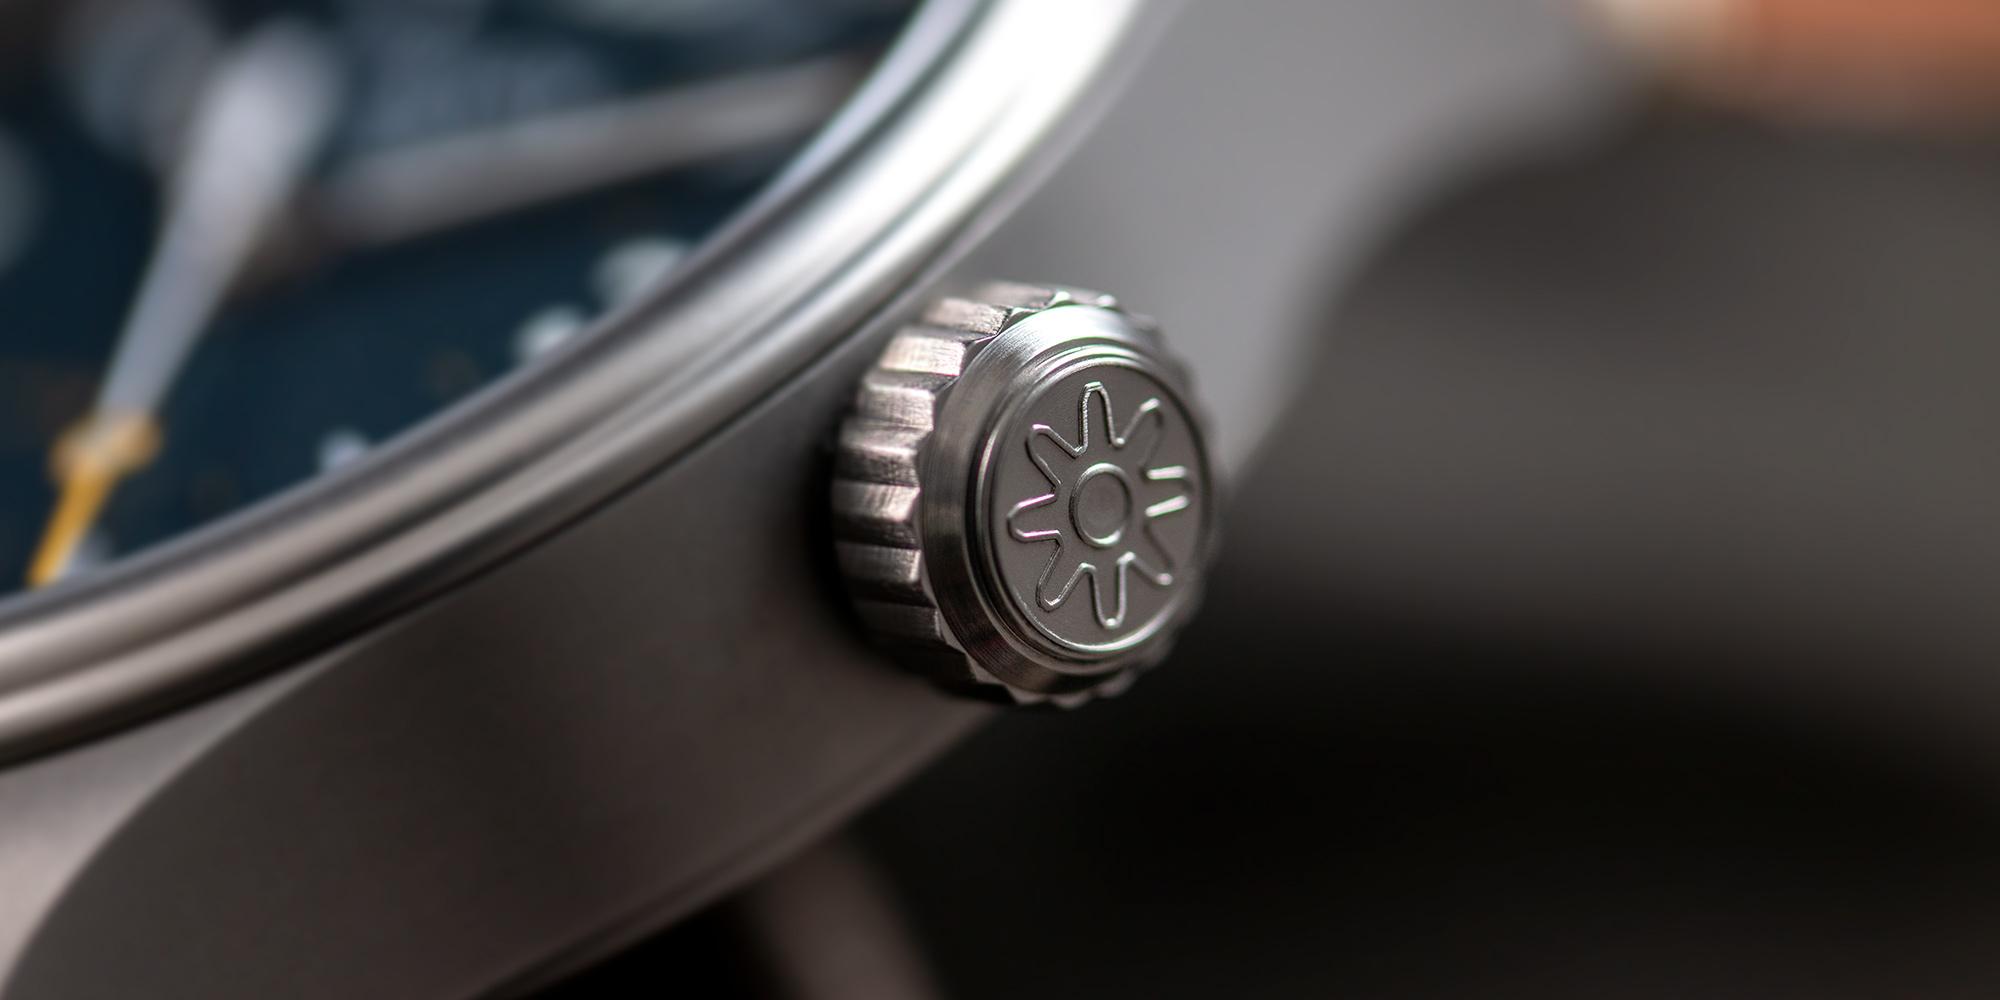 Pinion-Atom-39-no-date-watch-oxford-blue-006